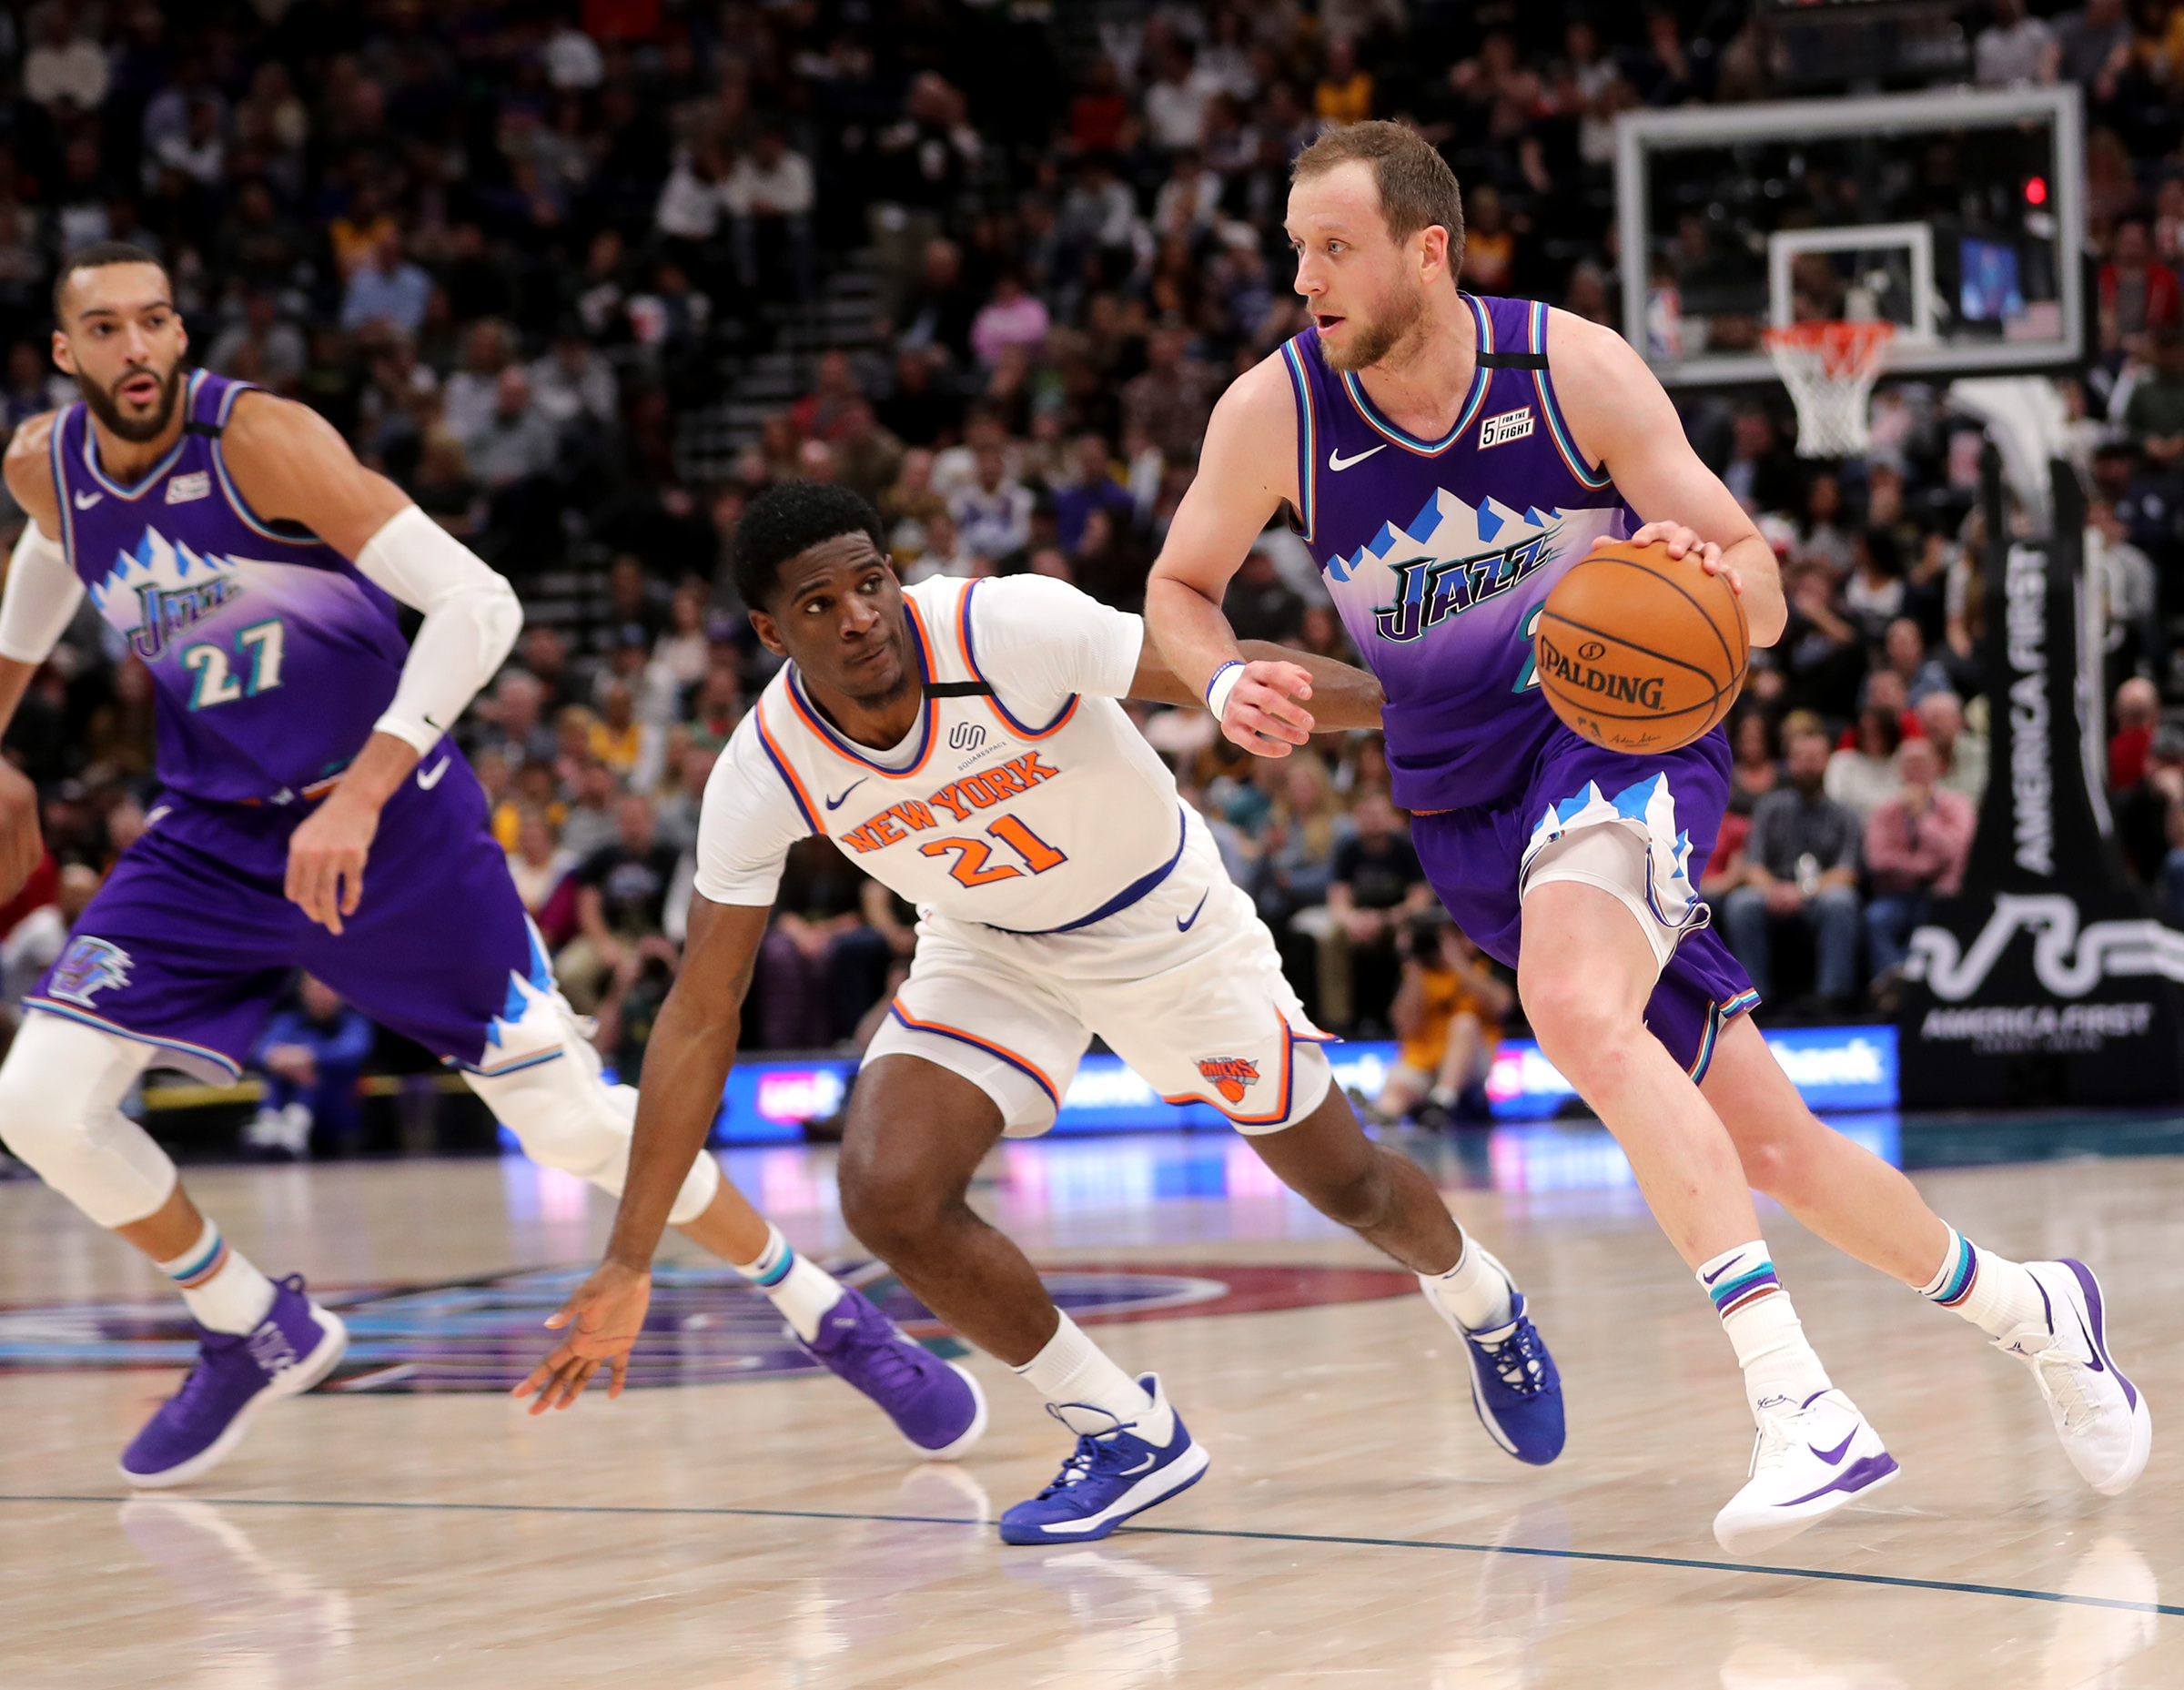 Joe Ingles drives around New York Knicks guard Damyean Dotson with Rudy Gobert trailing